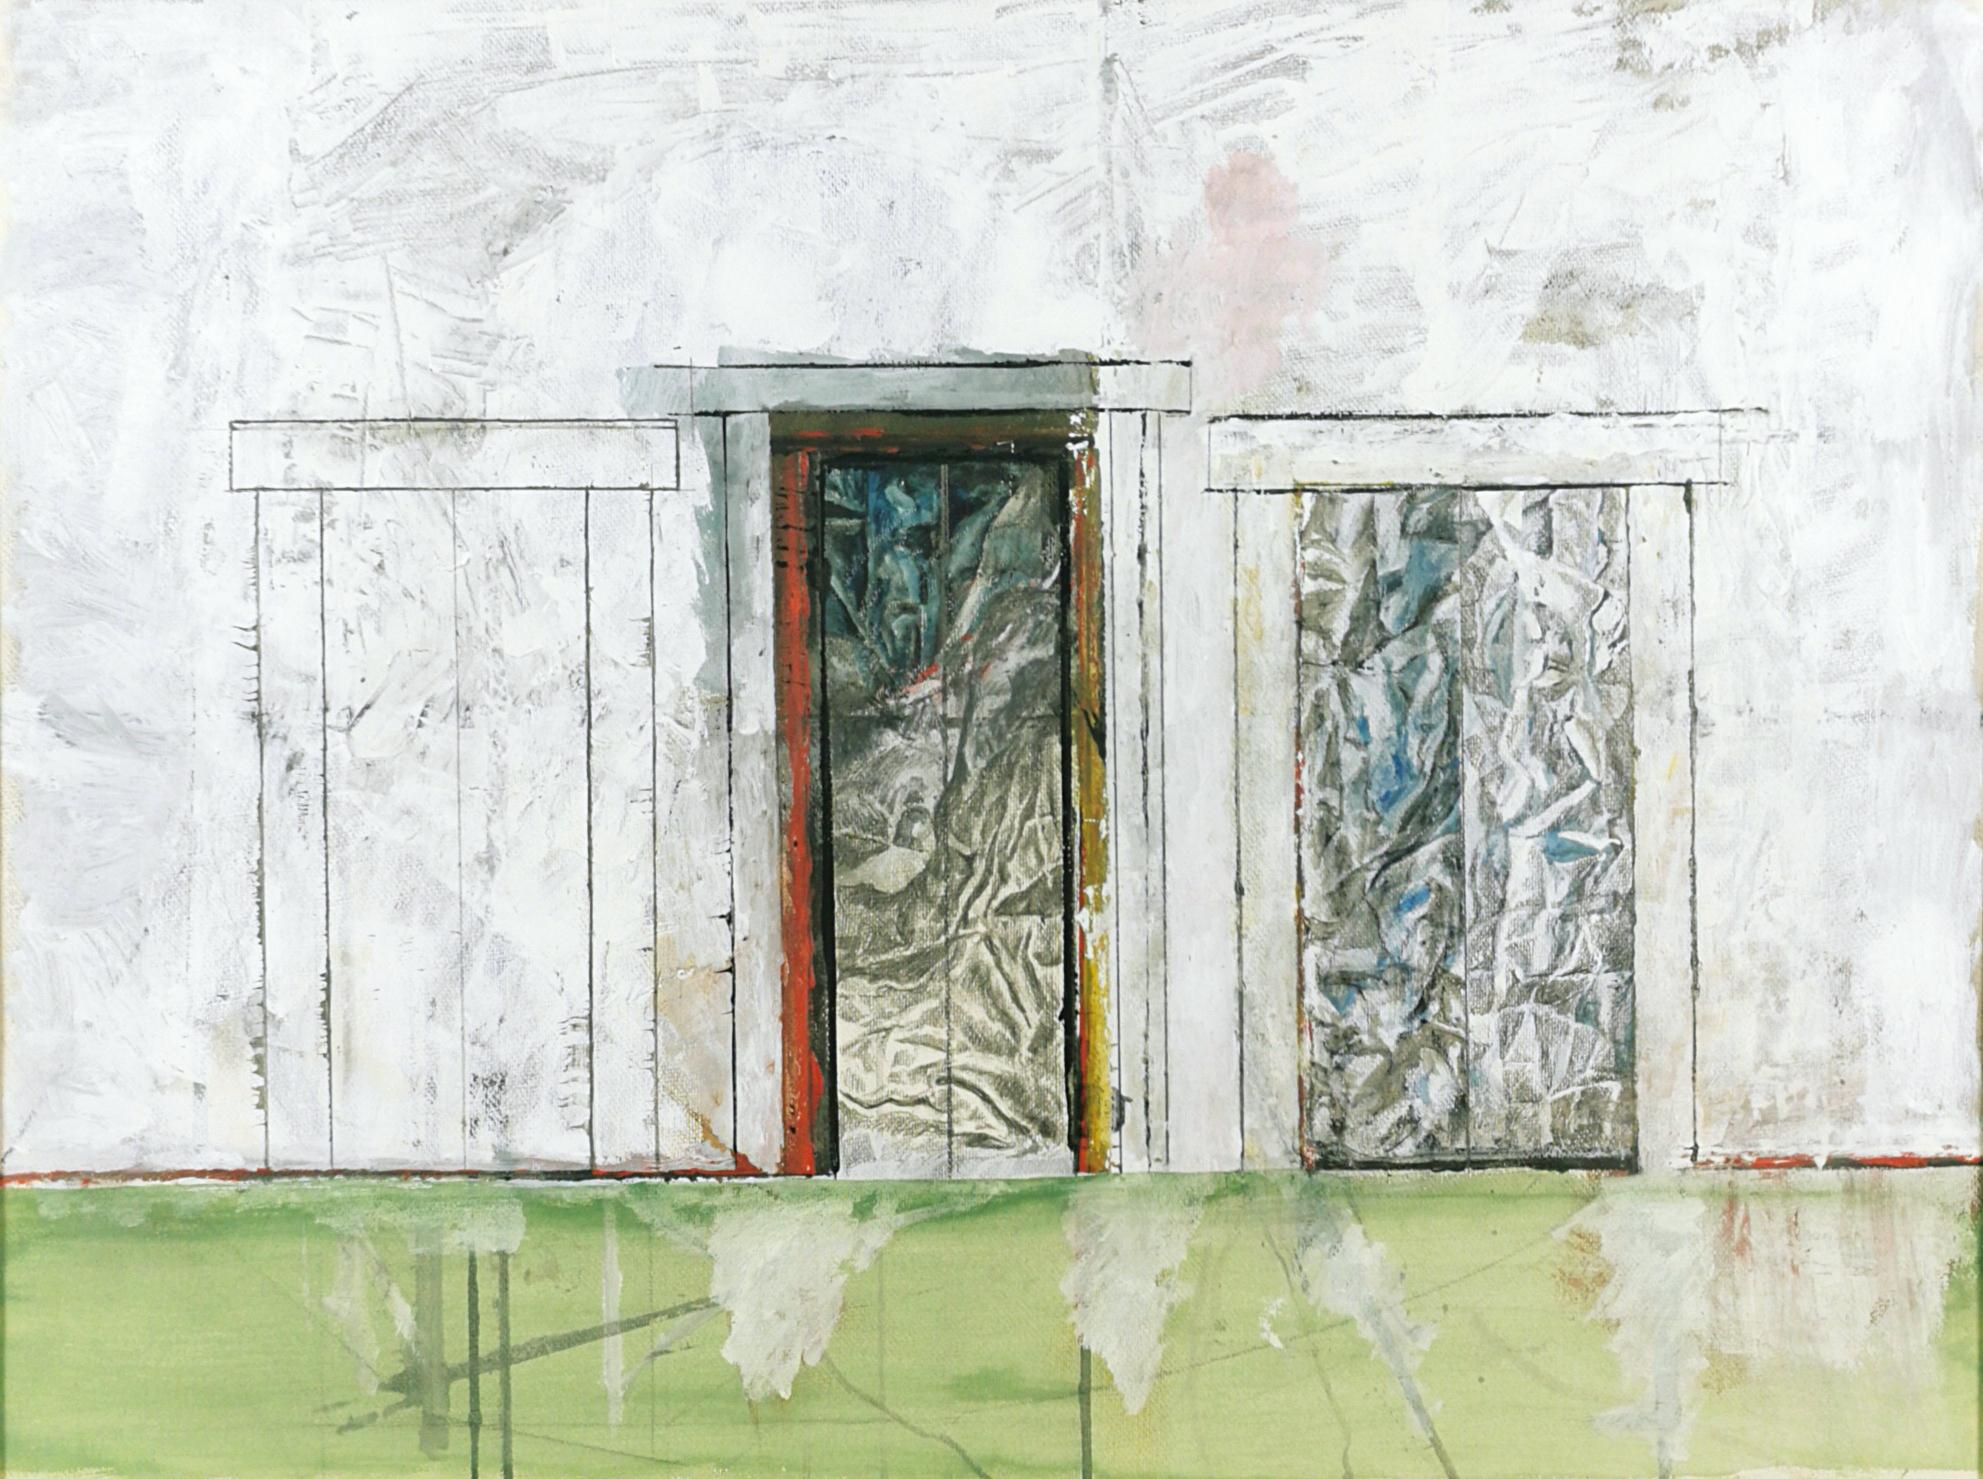 Rysunek świętego pokoju, 1999